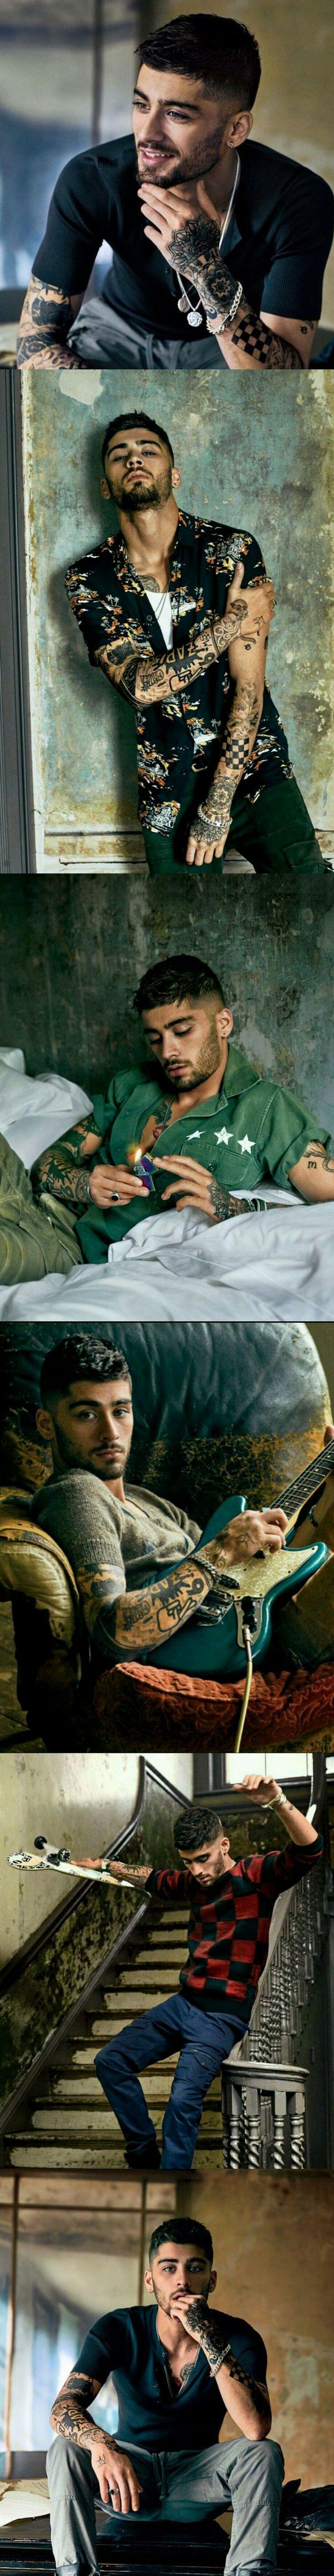 Zayn Malik for GQ ❥ #Zayn Malik